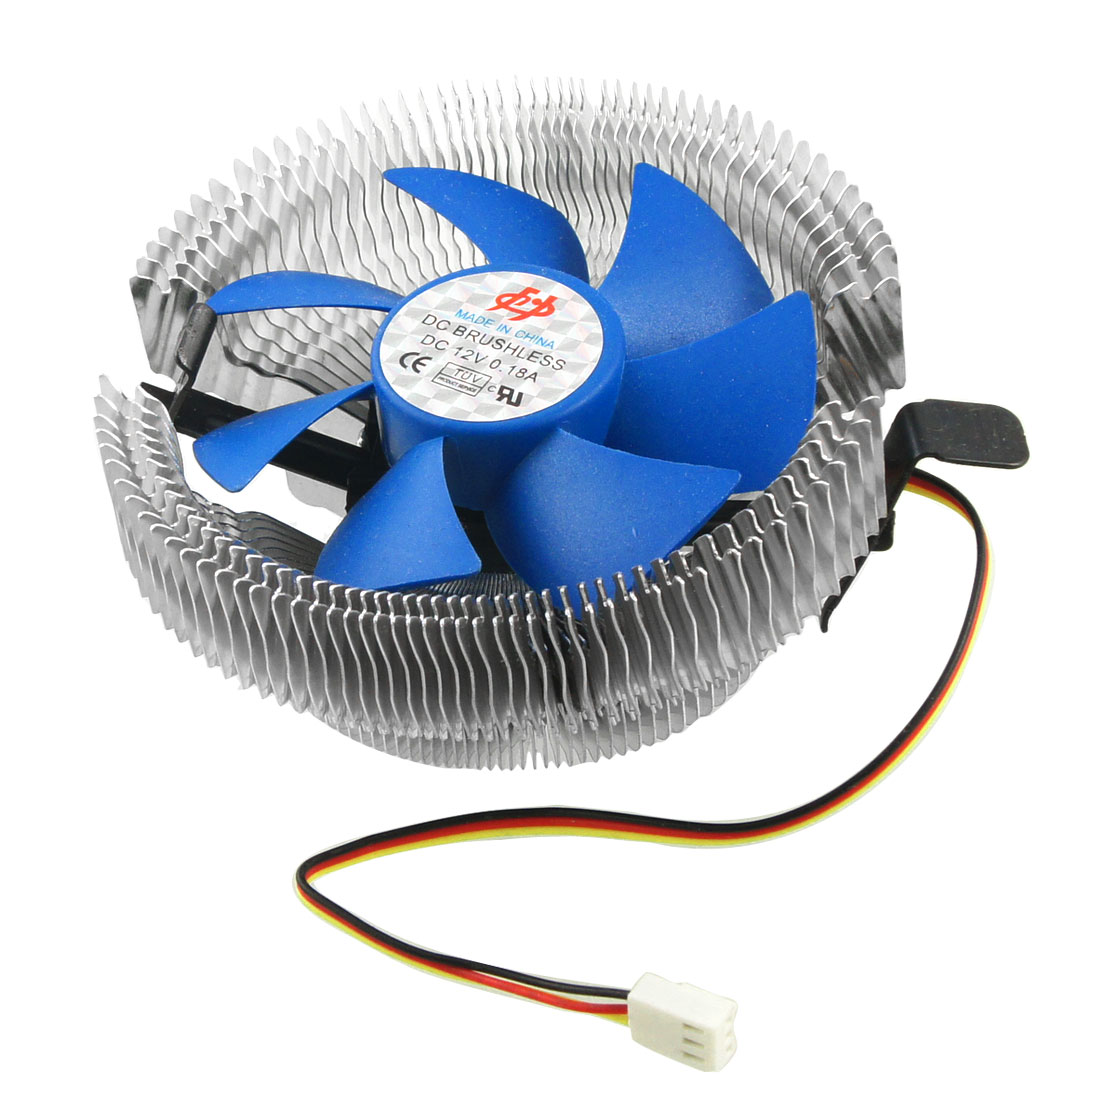 PC Silver Tone Blue Round Heatsink 3 Poles Connector CPU Cooler Fan